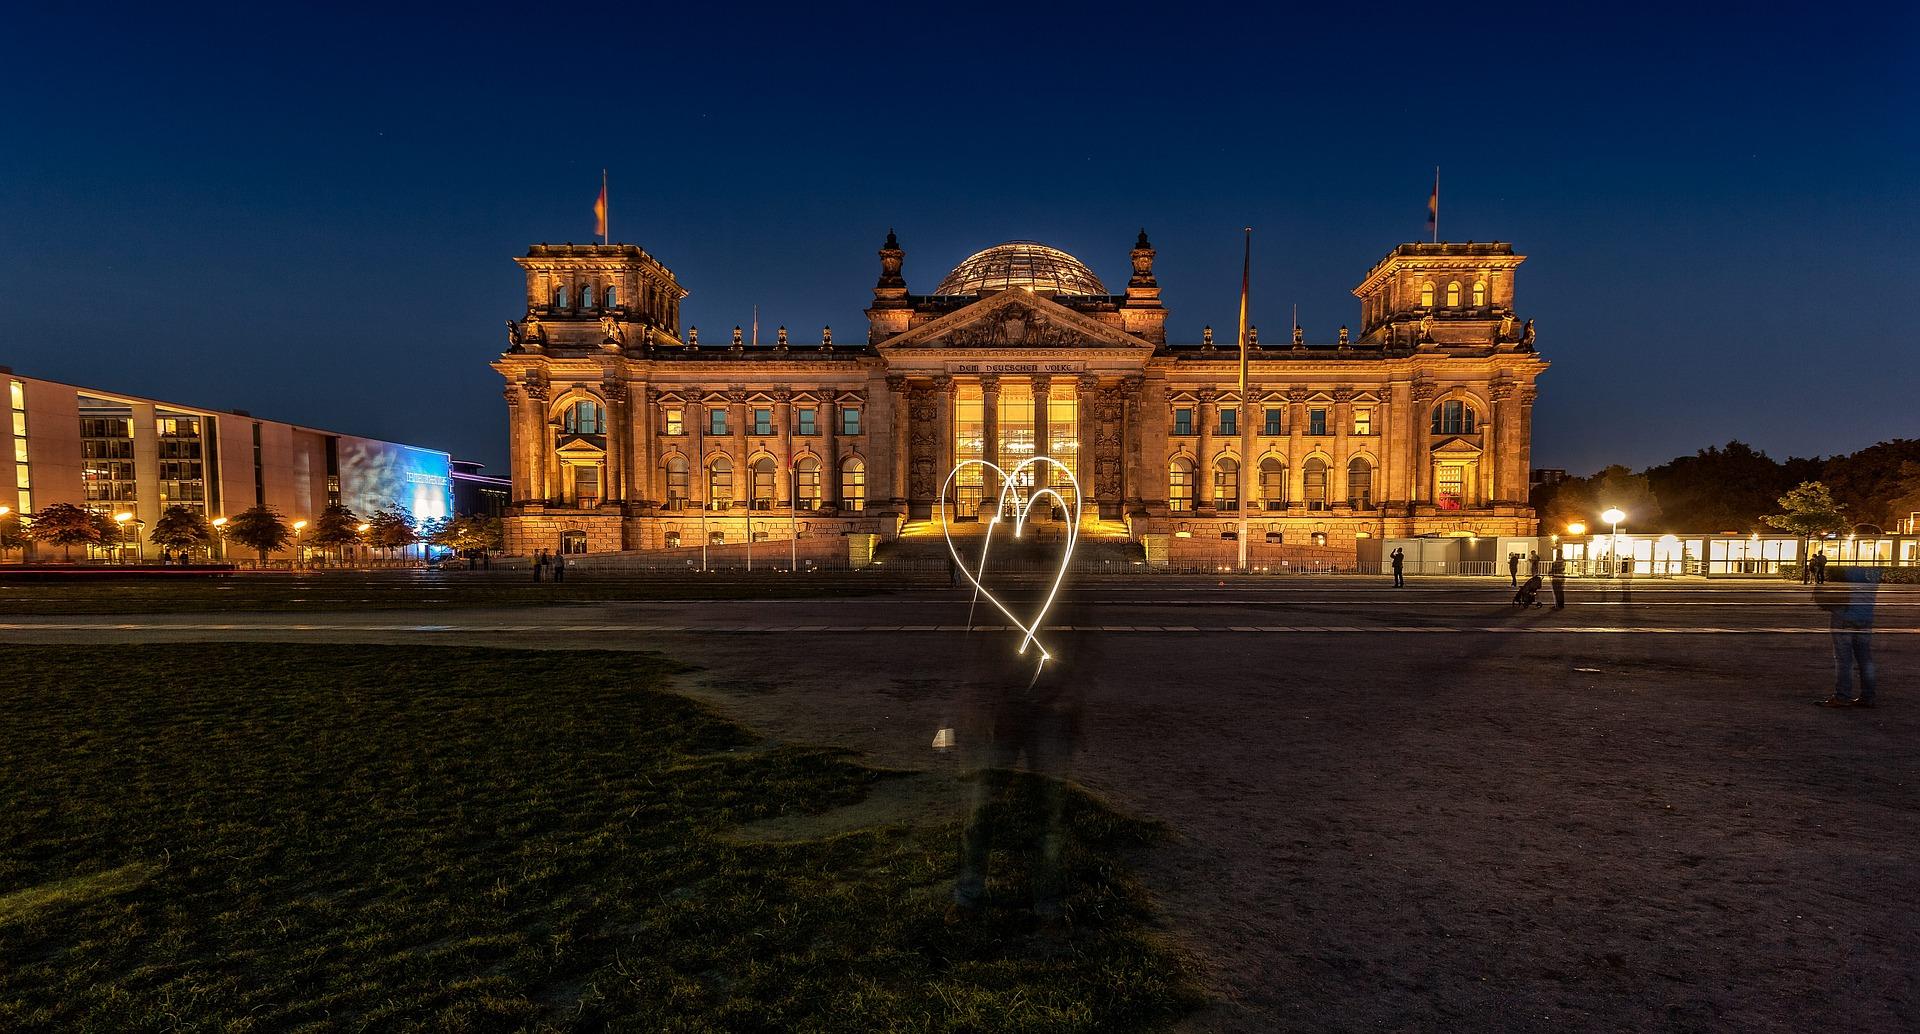 Elezioni Germania 2021 diretta live: affluenza, exit poll, risultati definitivi